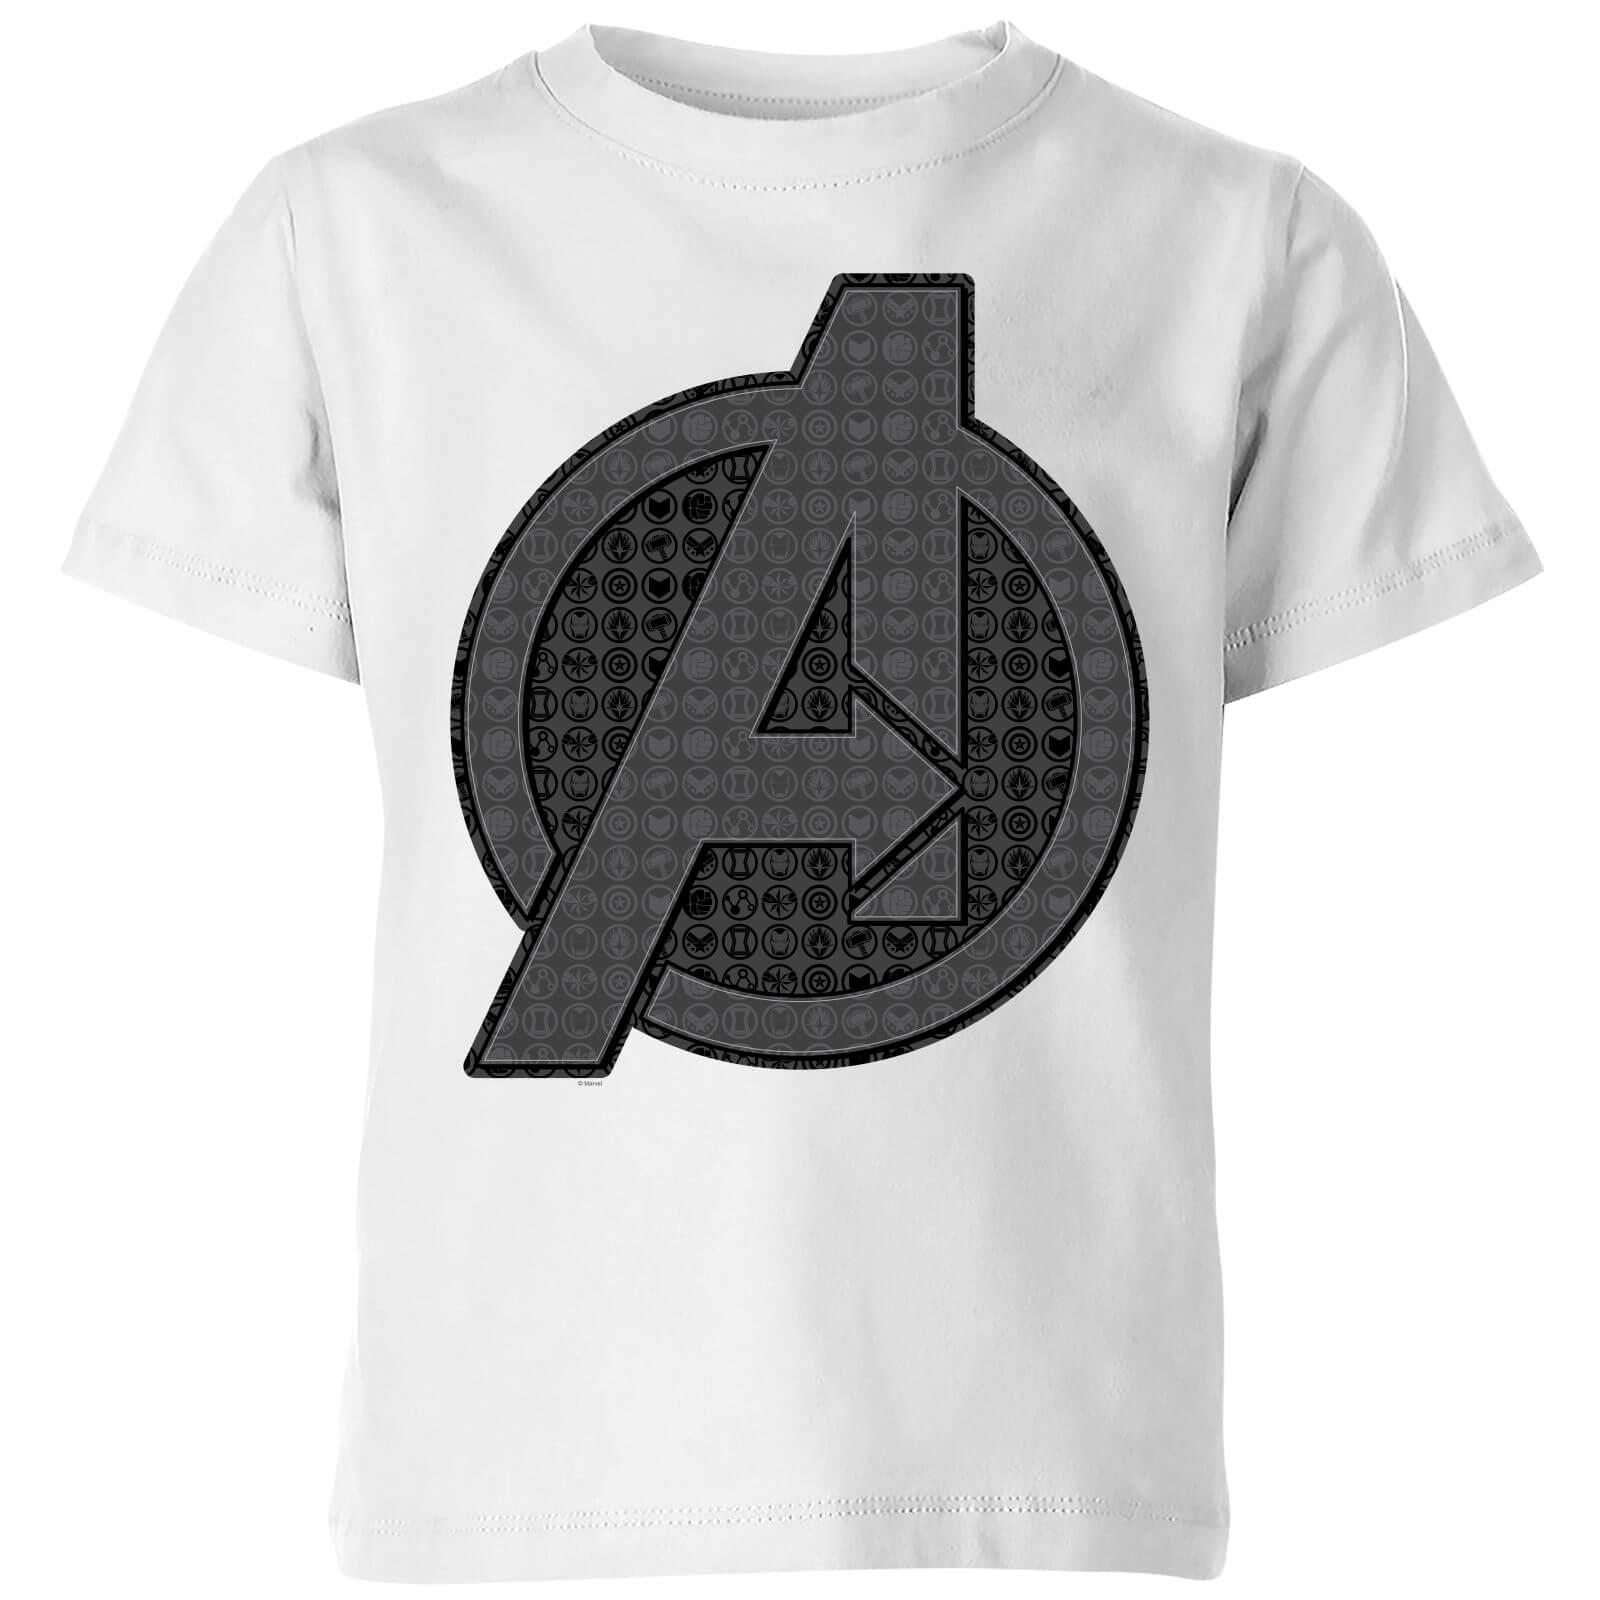 Avengers Endgame Iconic Logo Kids' T-Shirt - White - 3-4 Years - White